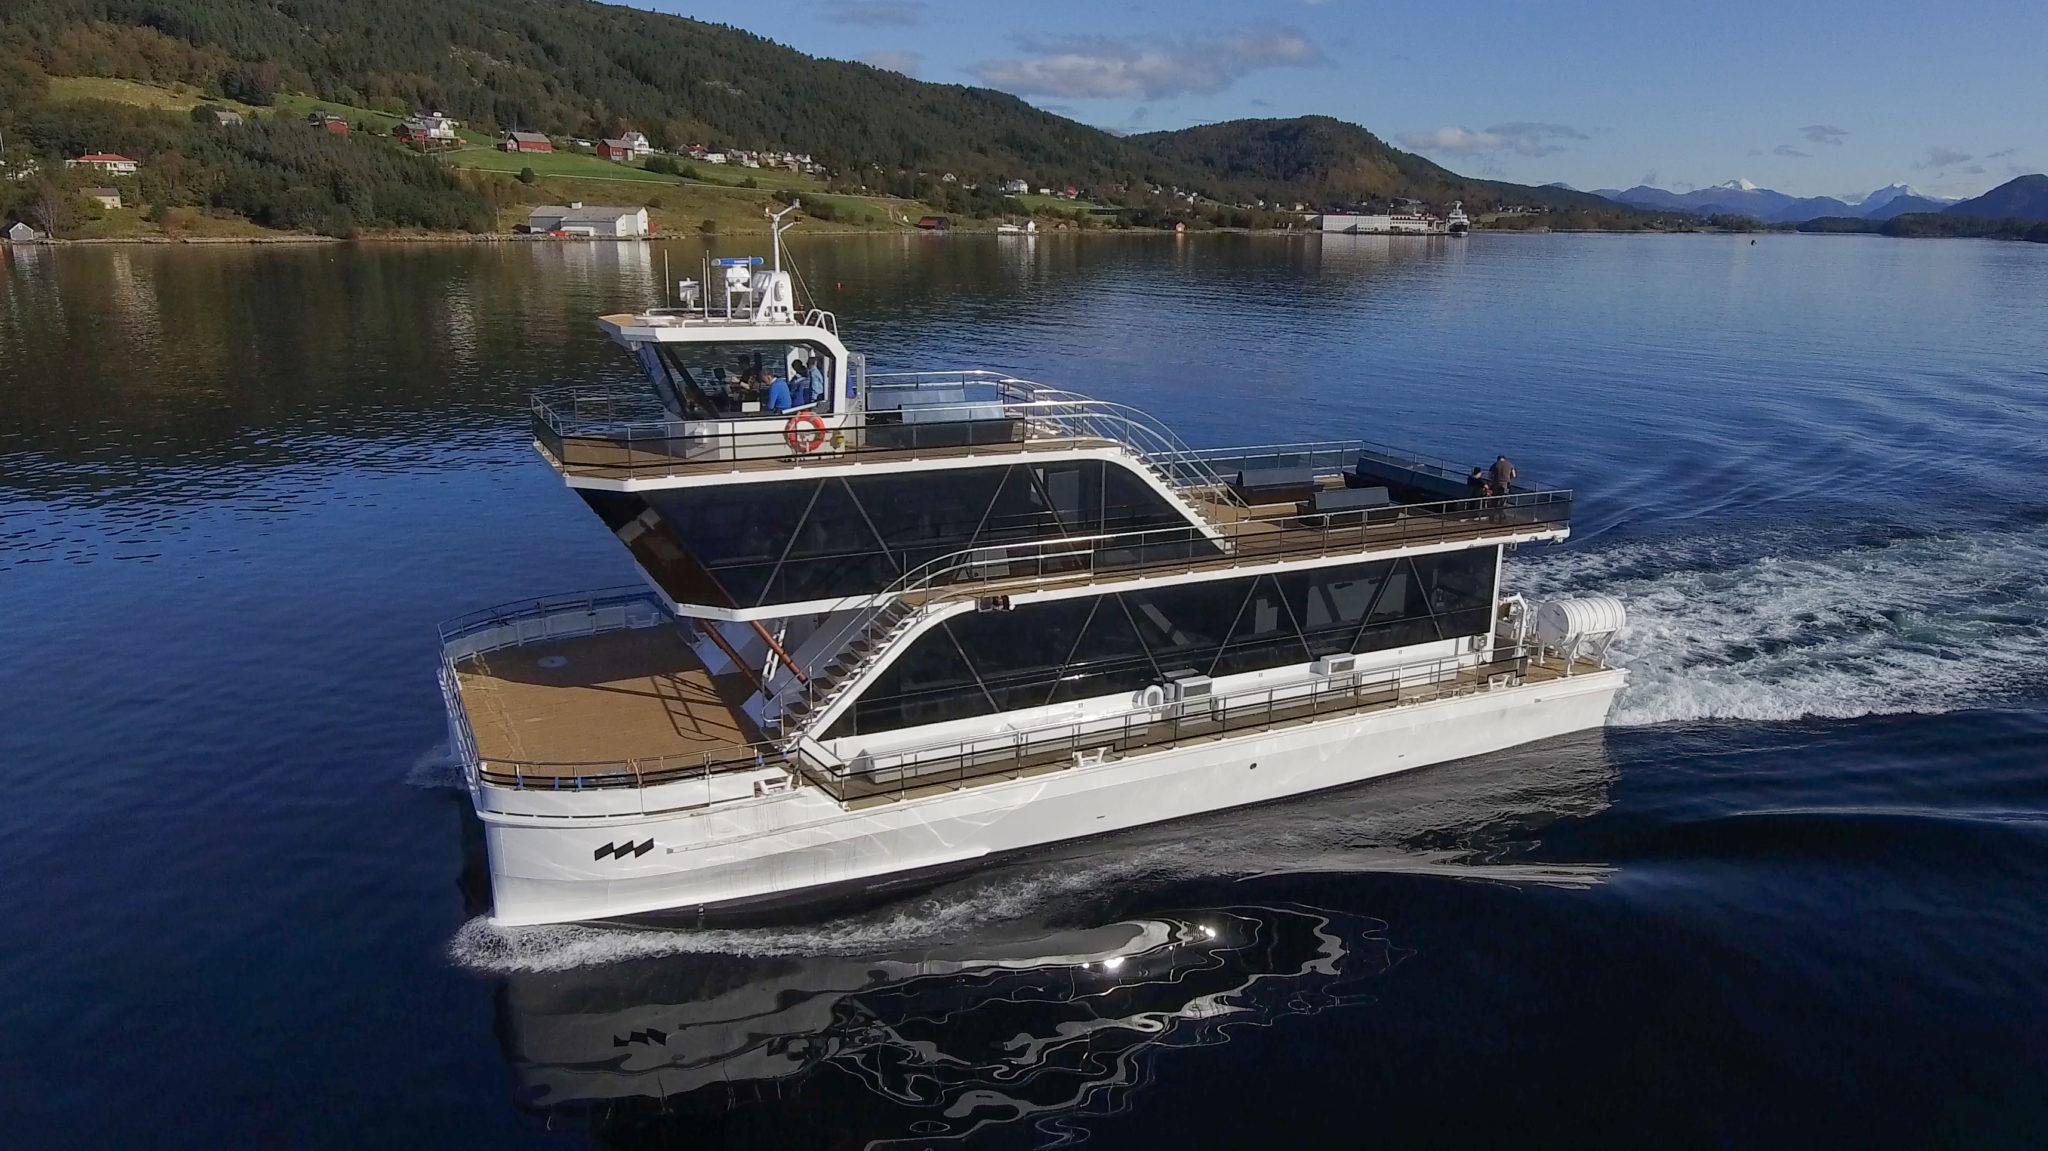 Brim Explorer - Cruise news